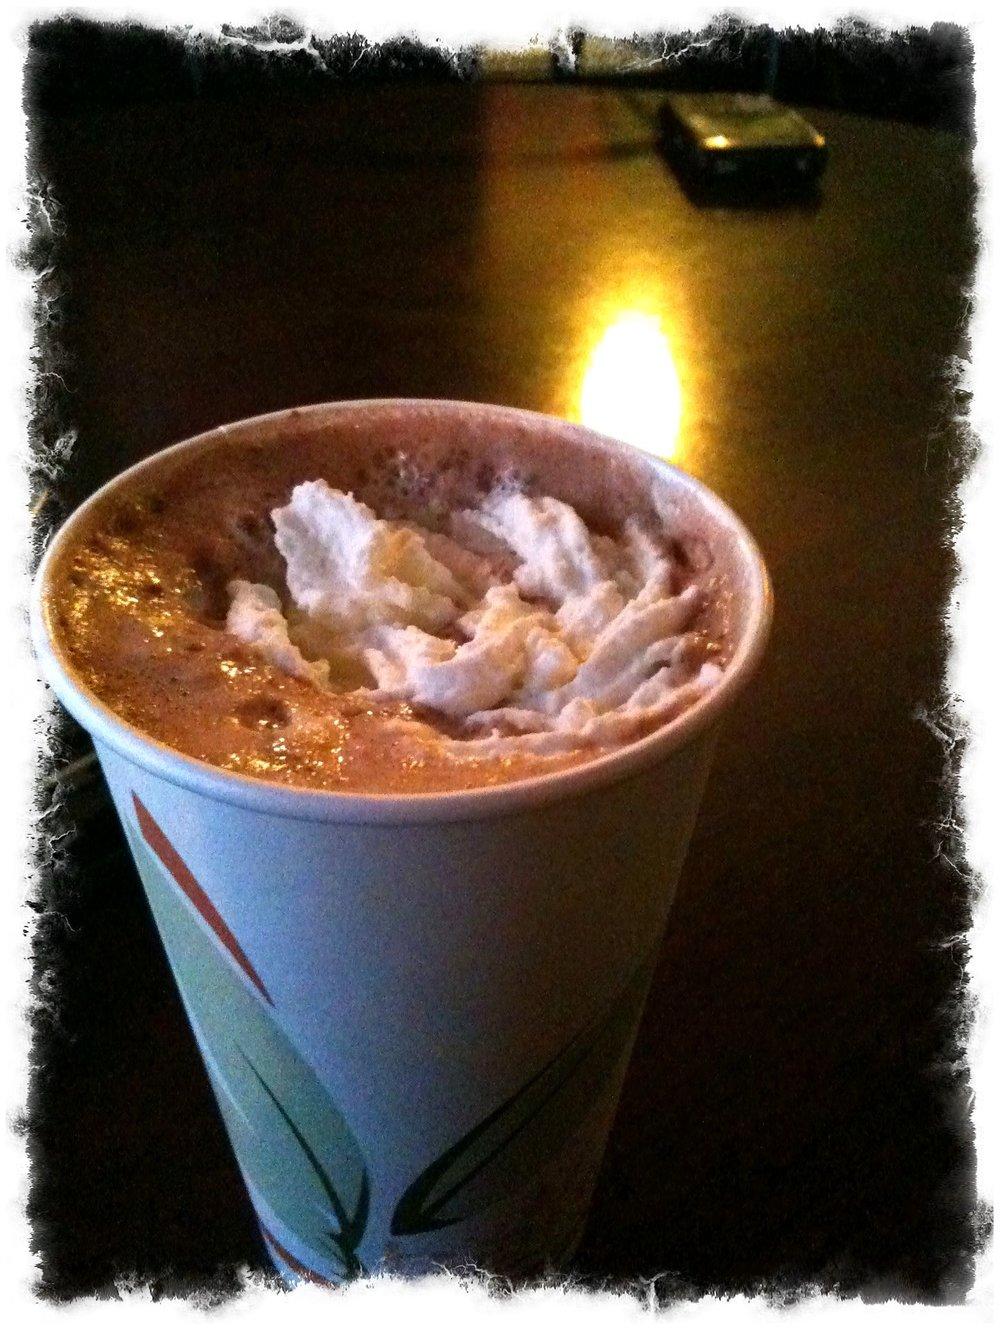 the-ohio-coffee-company-dayton-oh_5230112946_o.jpg